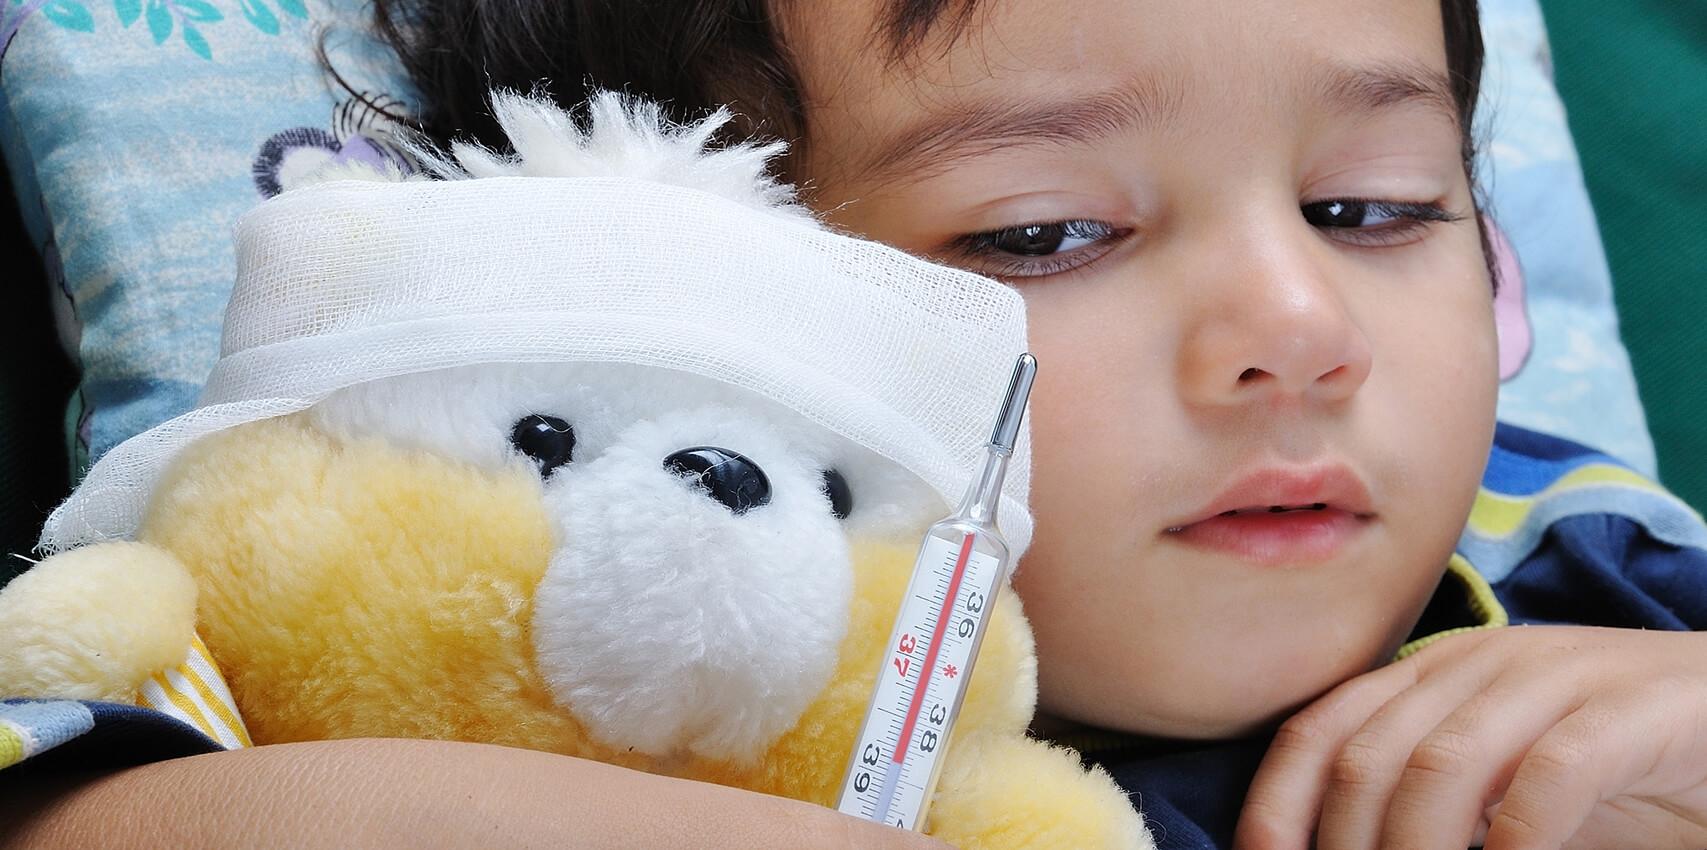 Пневмония народная медицина 25 фотография